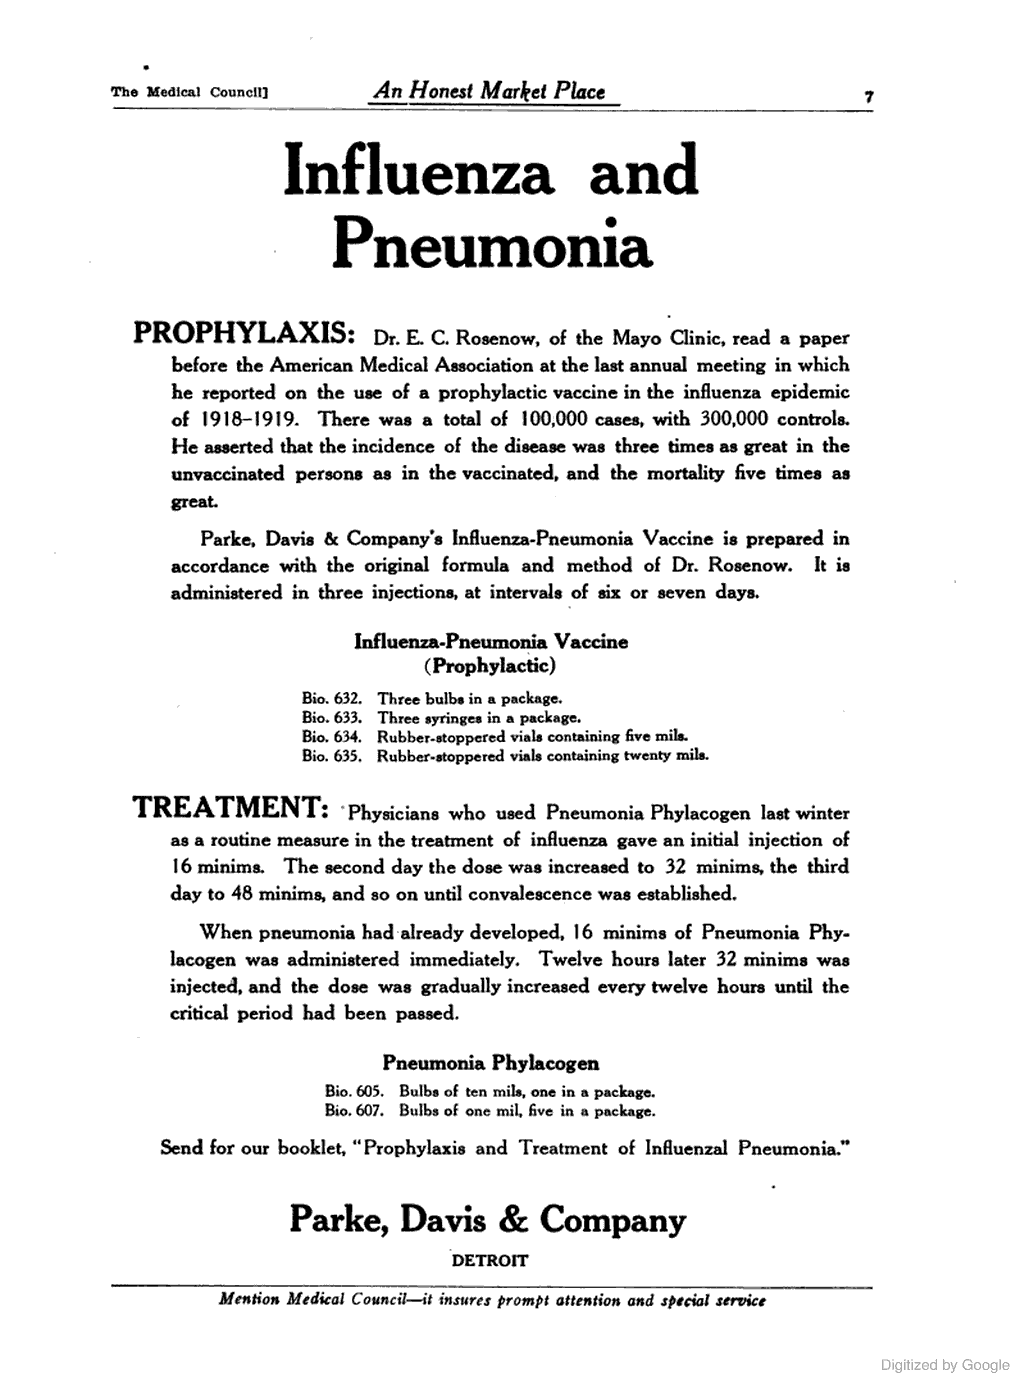 Pfizer Phylacogen Scam 1913.jpg